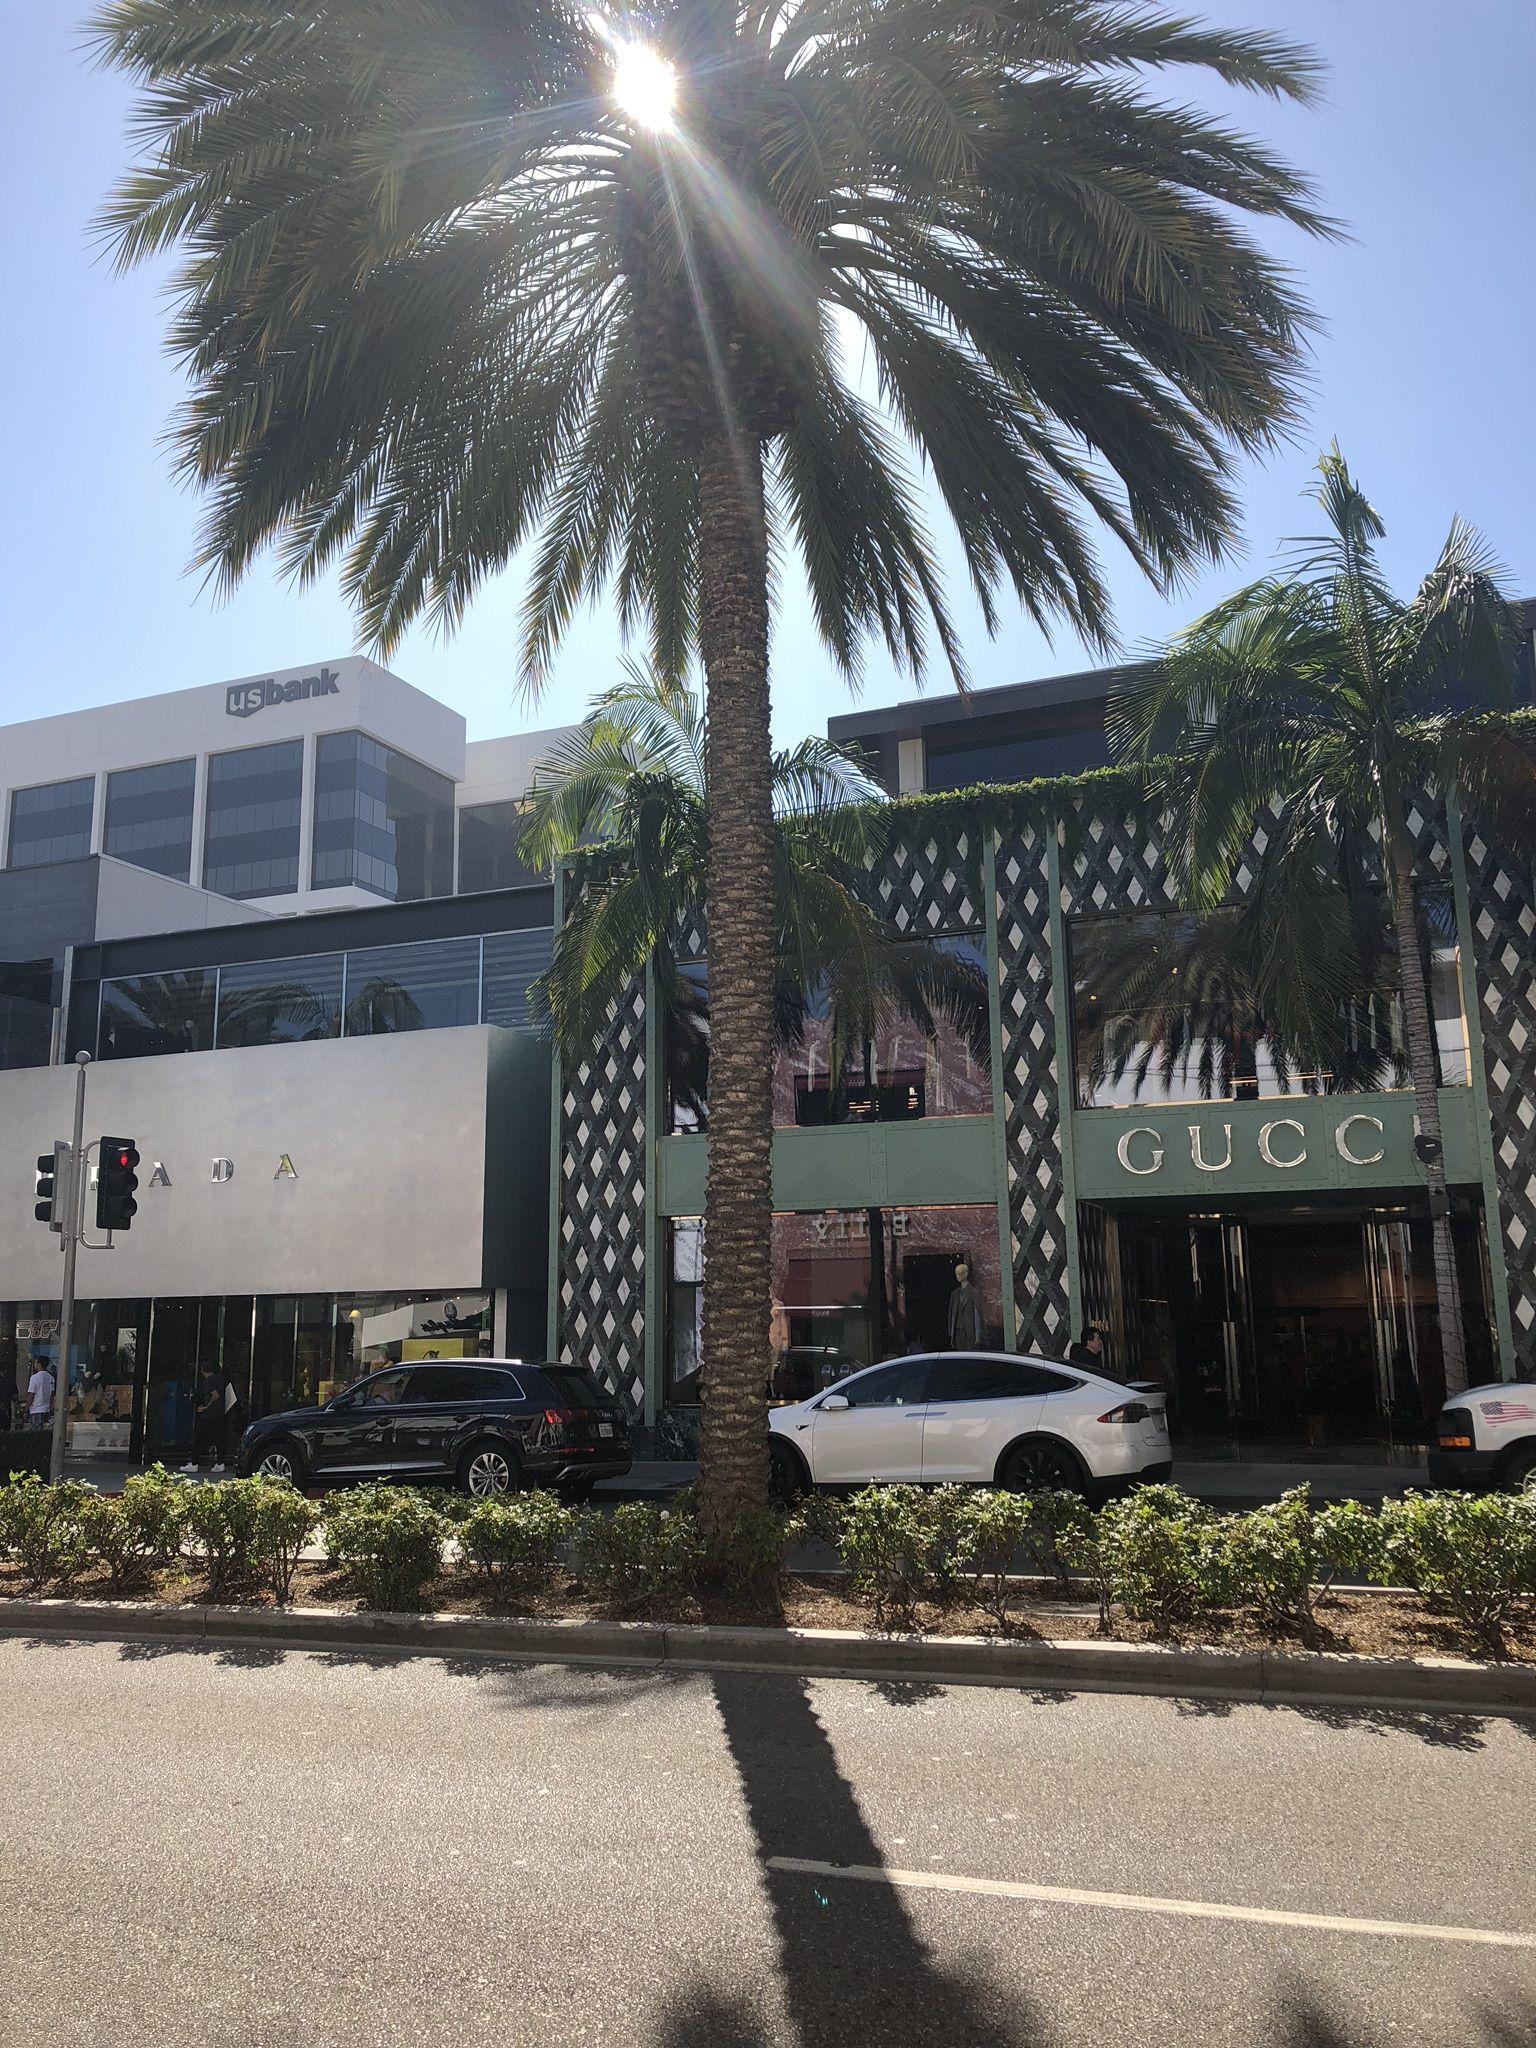 Luxury Designer Shops Along Rodeo Drive, Los Angeles